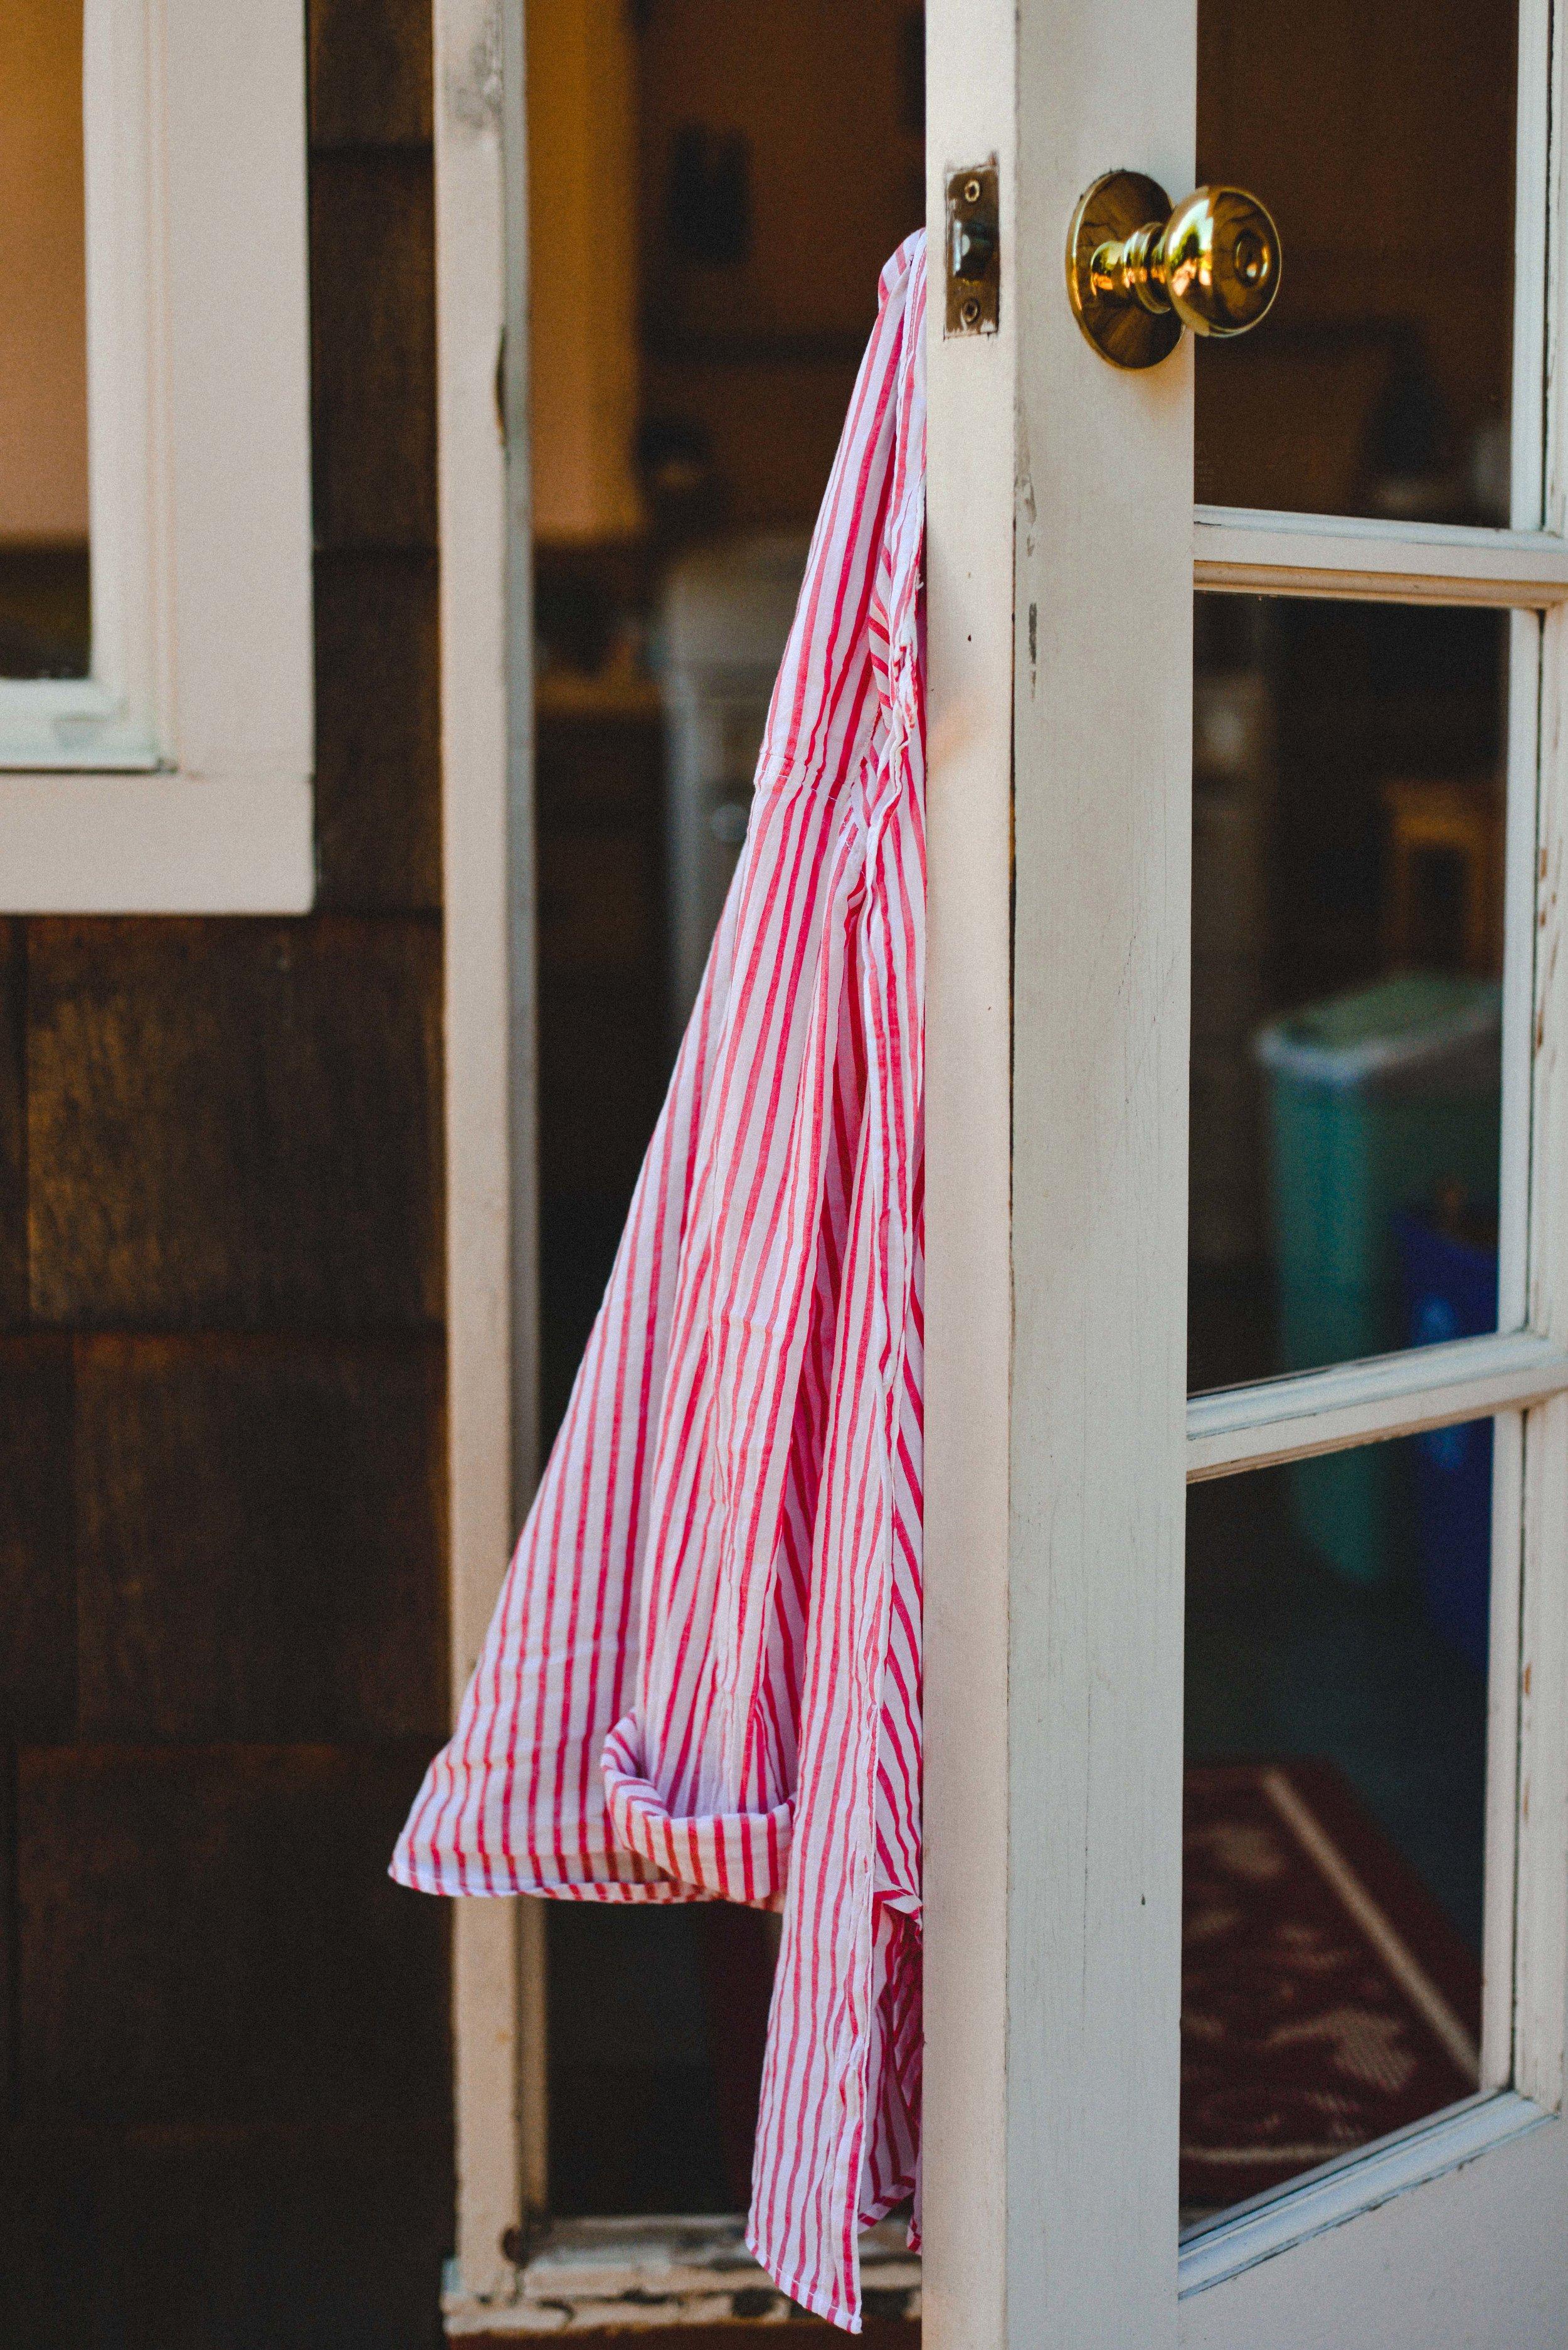 ryan thompson creative photography - shirt in the wind